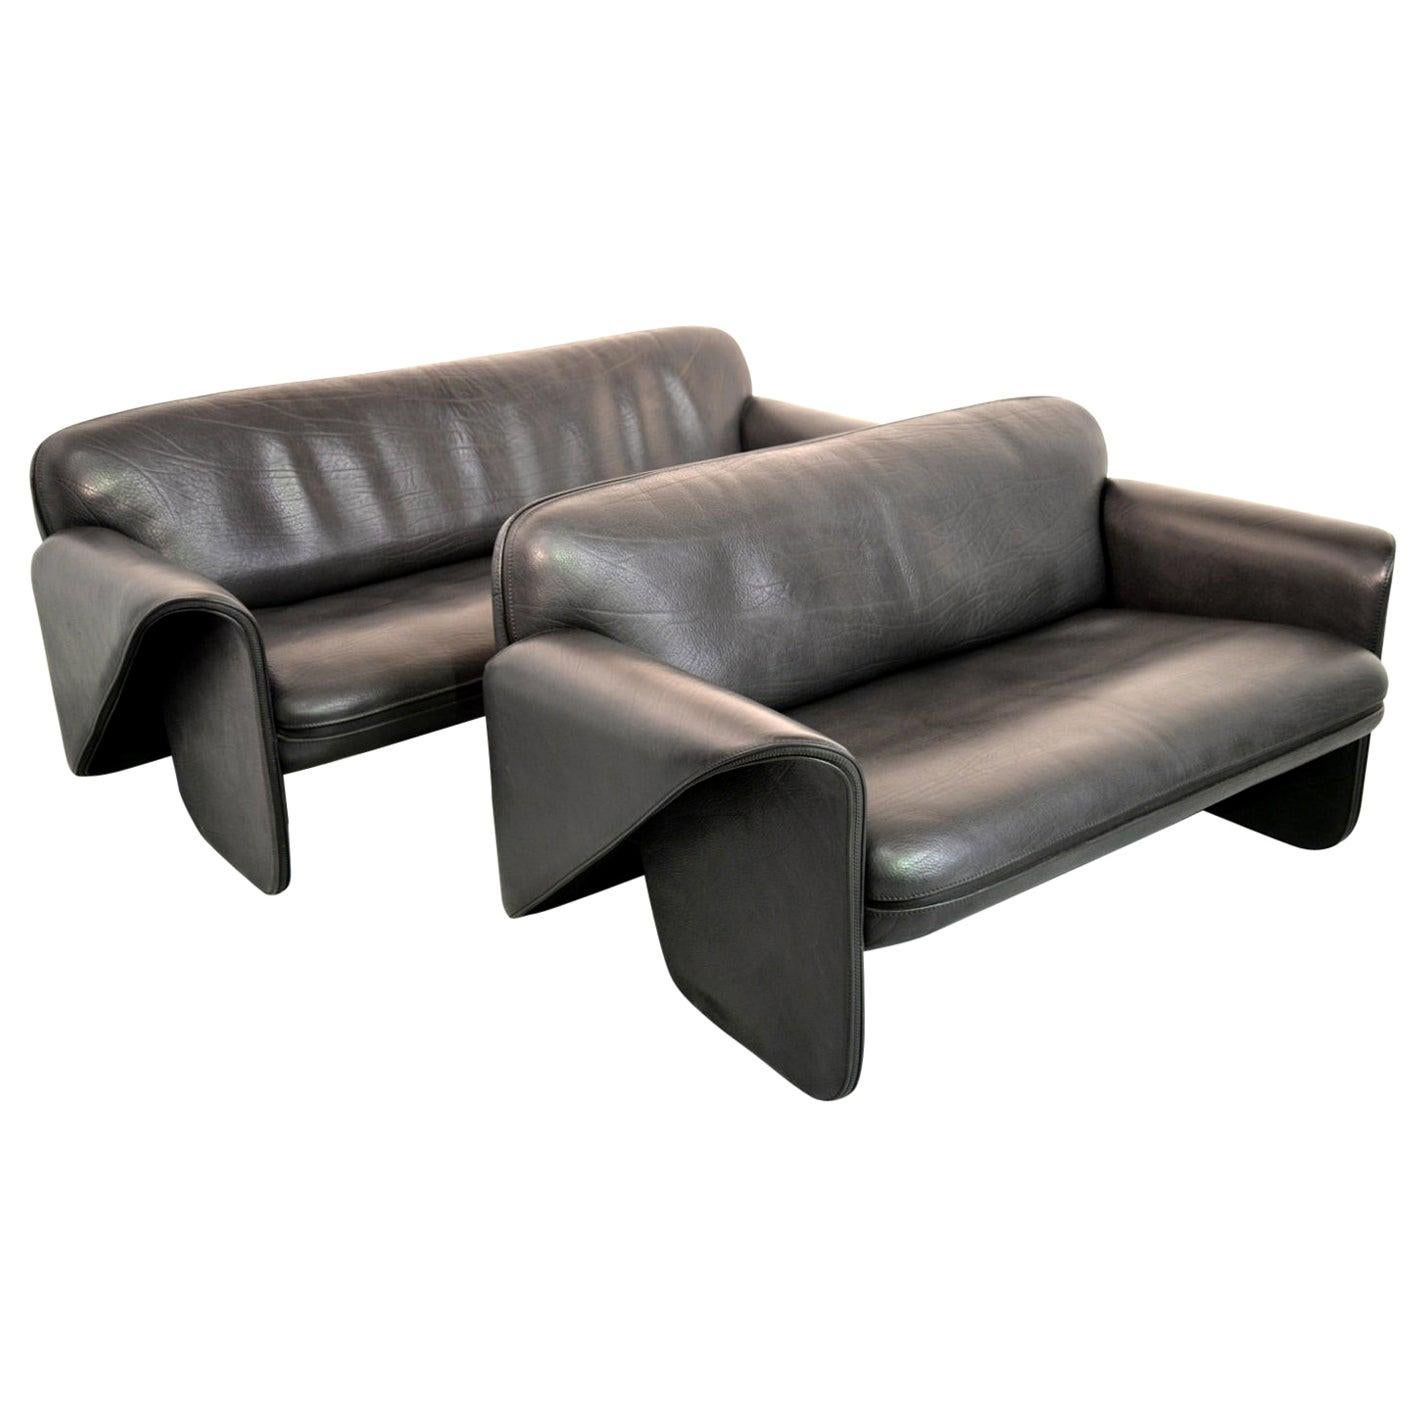 Vintage De Sede DS 125 Sofas Designed by Gerd Lange, Switzerland, 1978